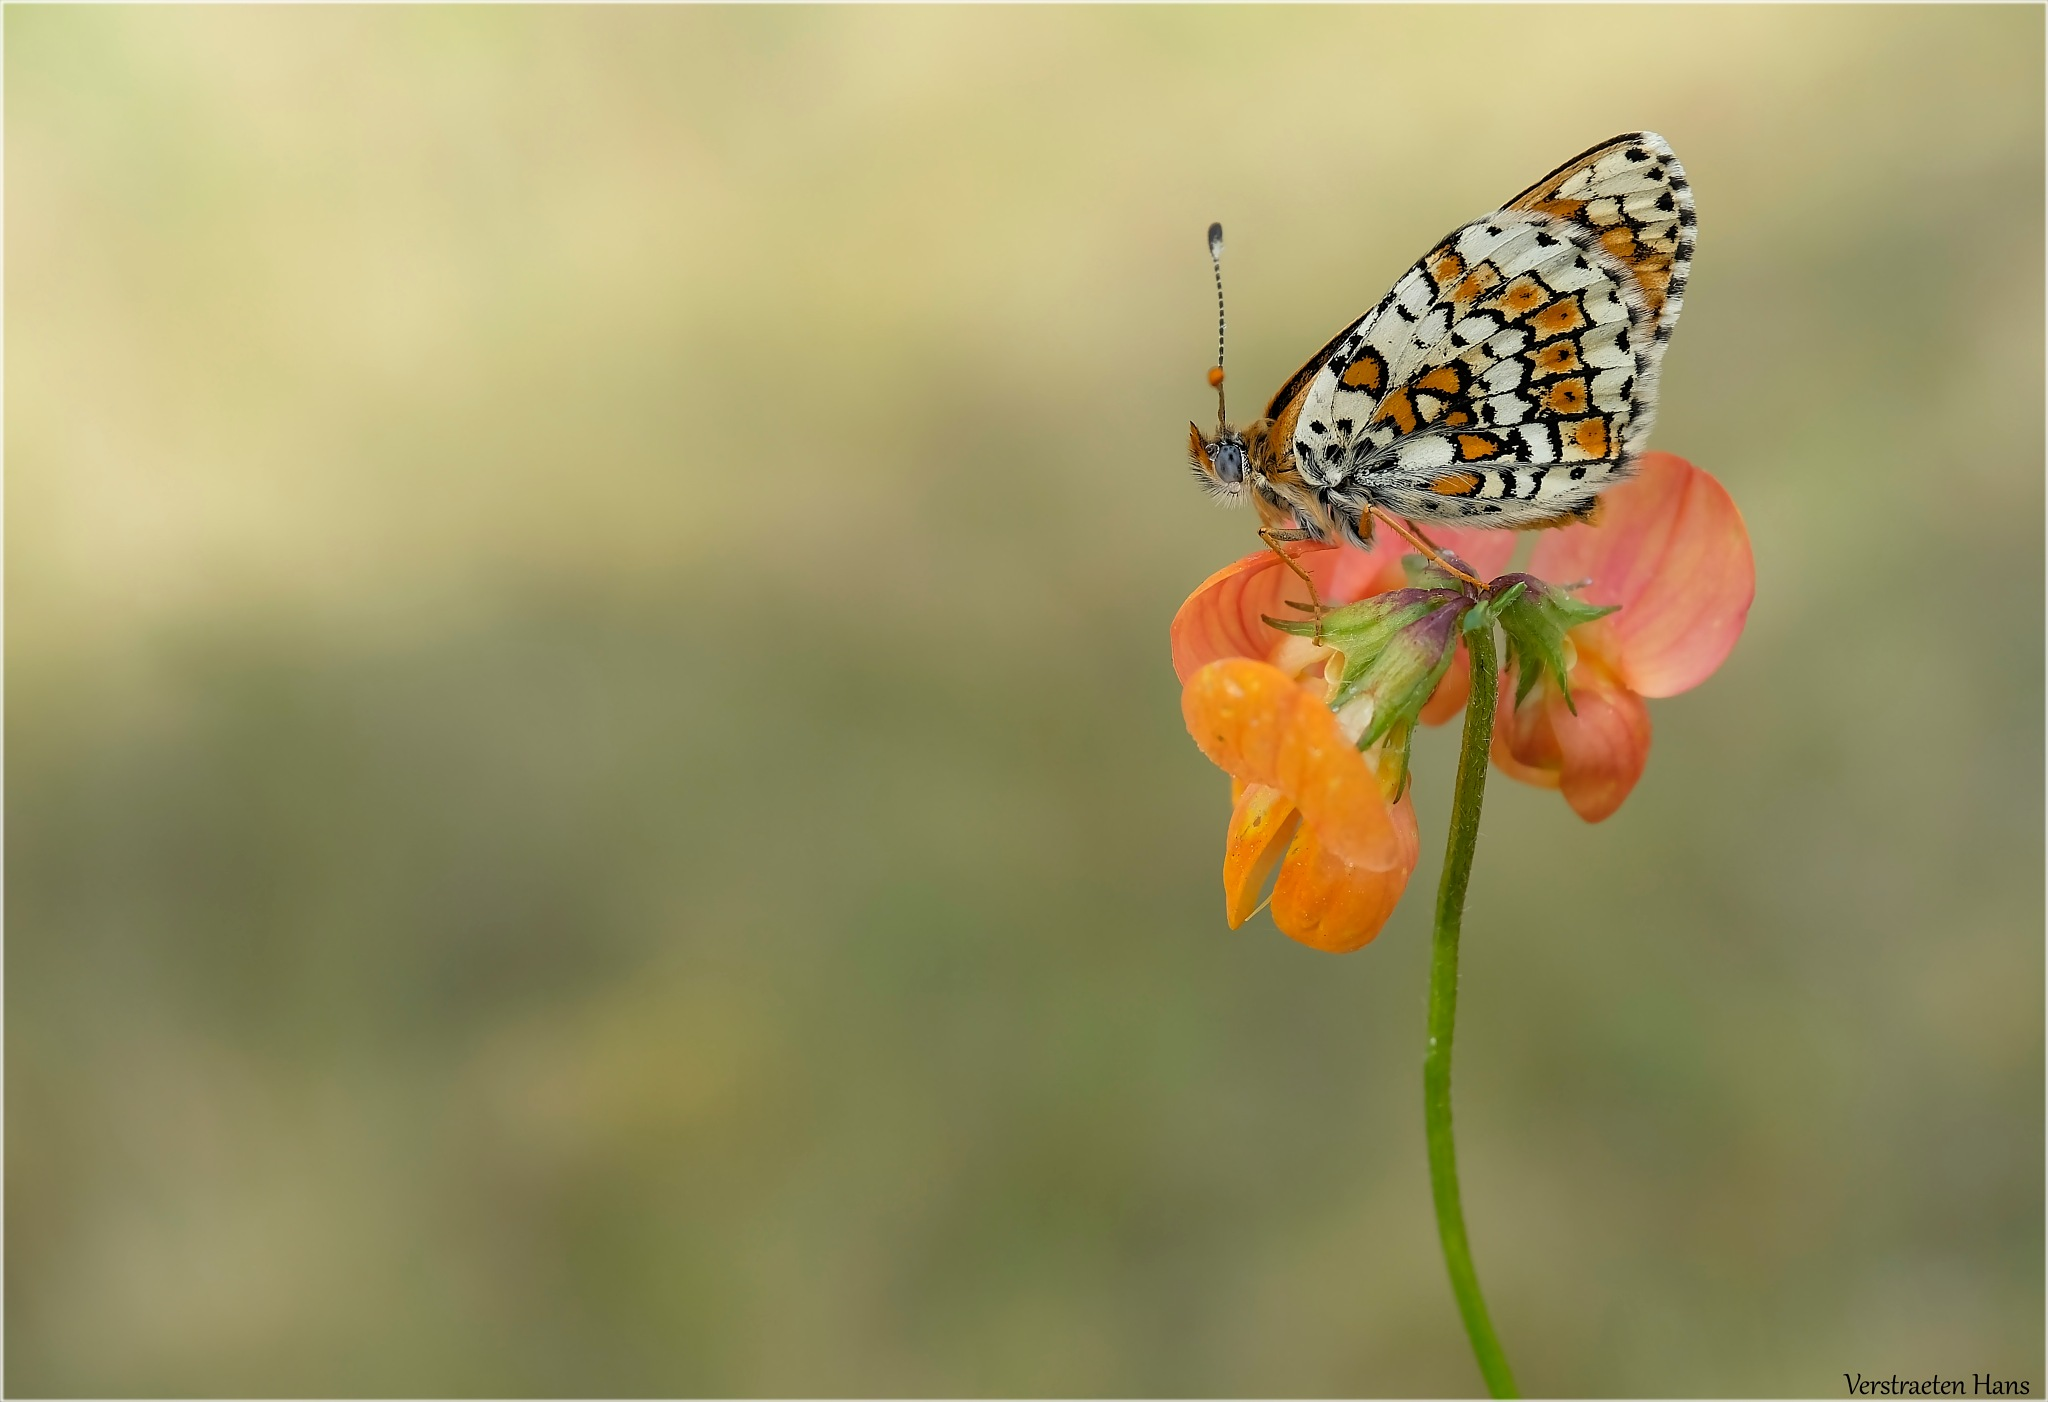 Veldparelmoervlinder (Melitaea cinxia) by zard319